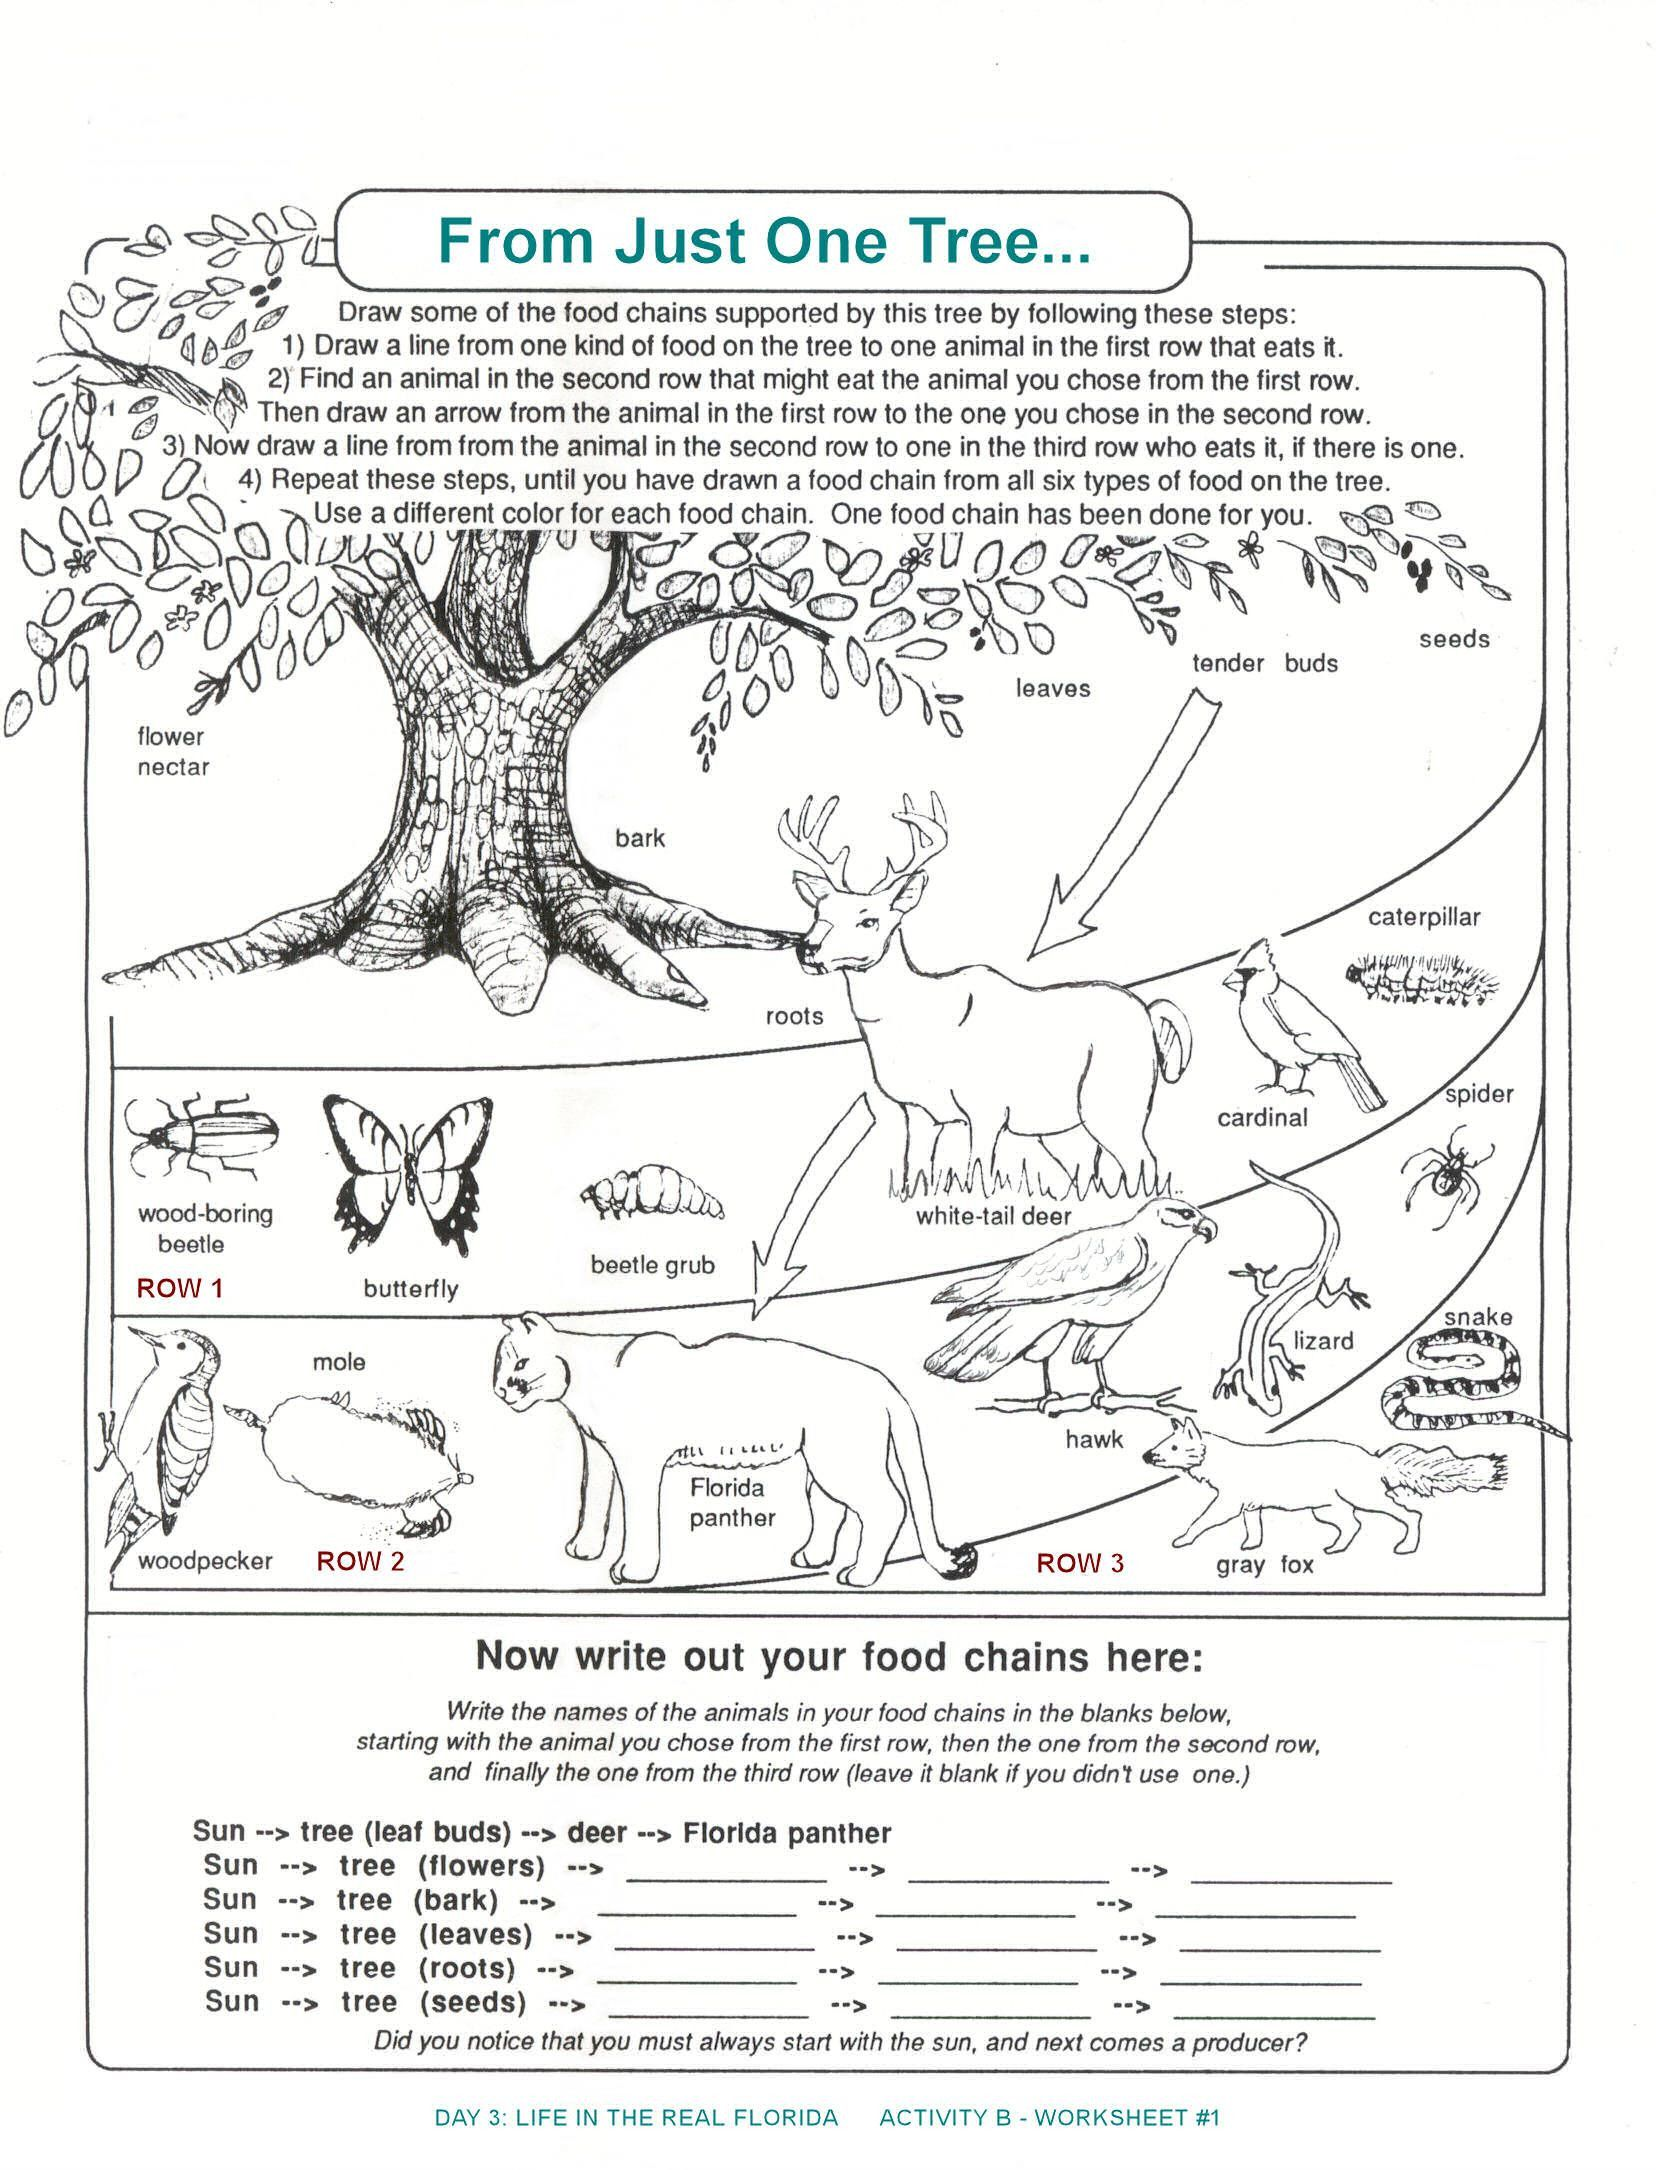 3rd Grade Ecosystem Worksheets In